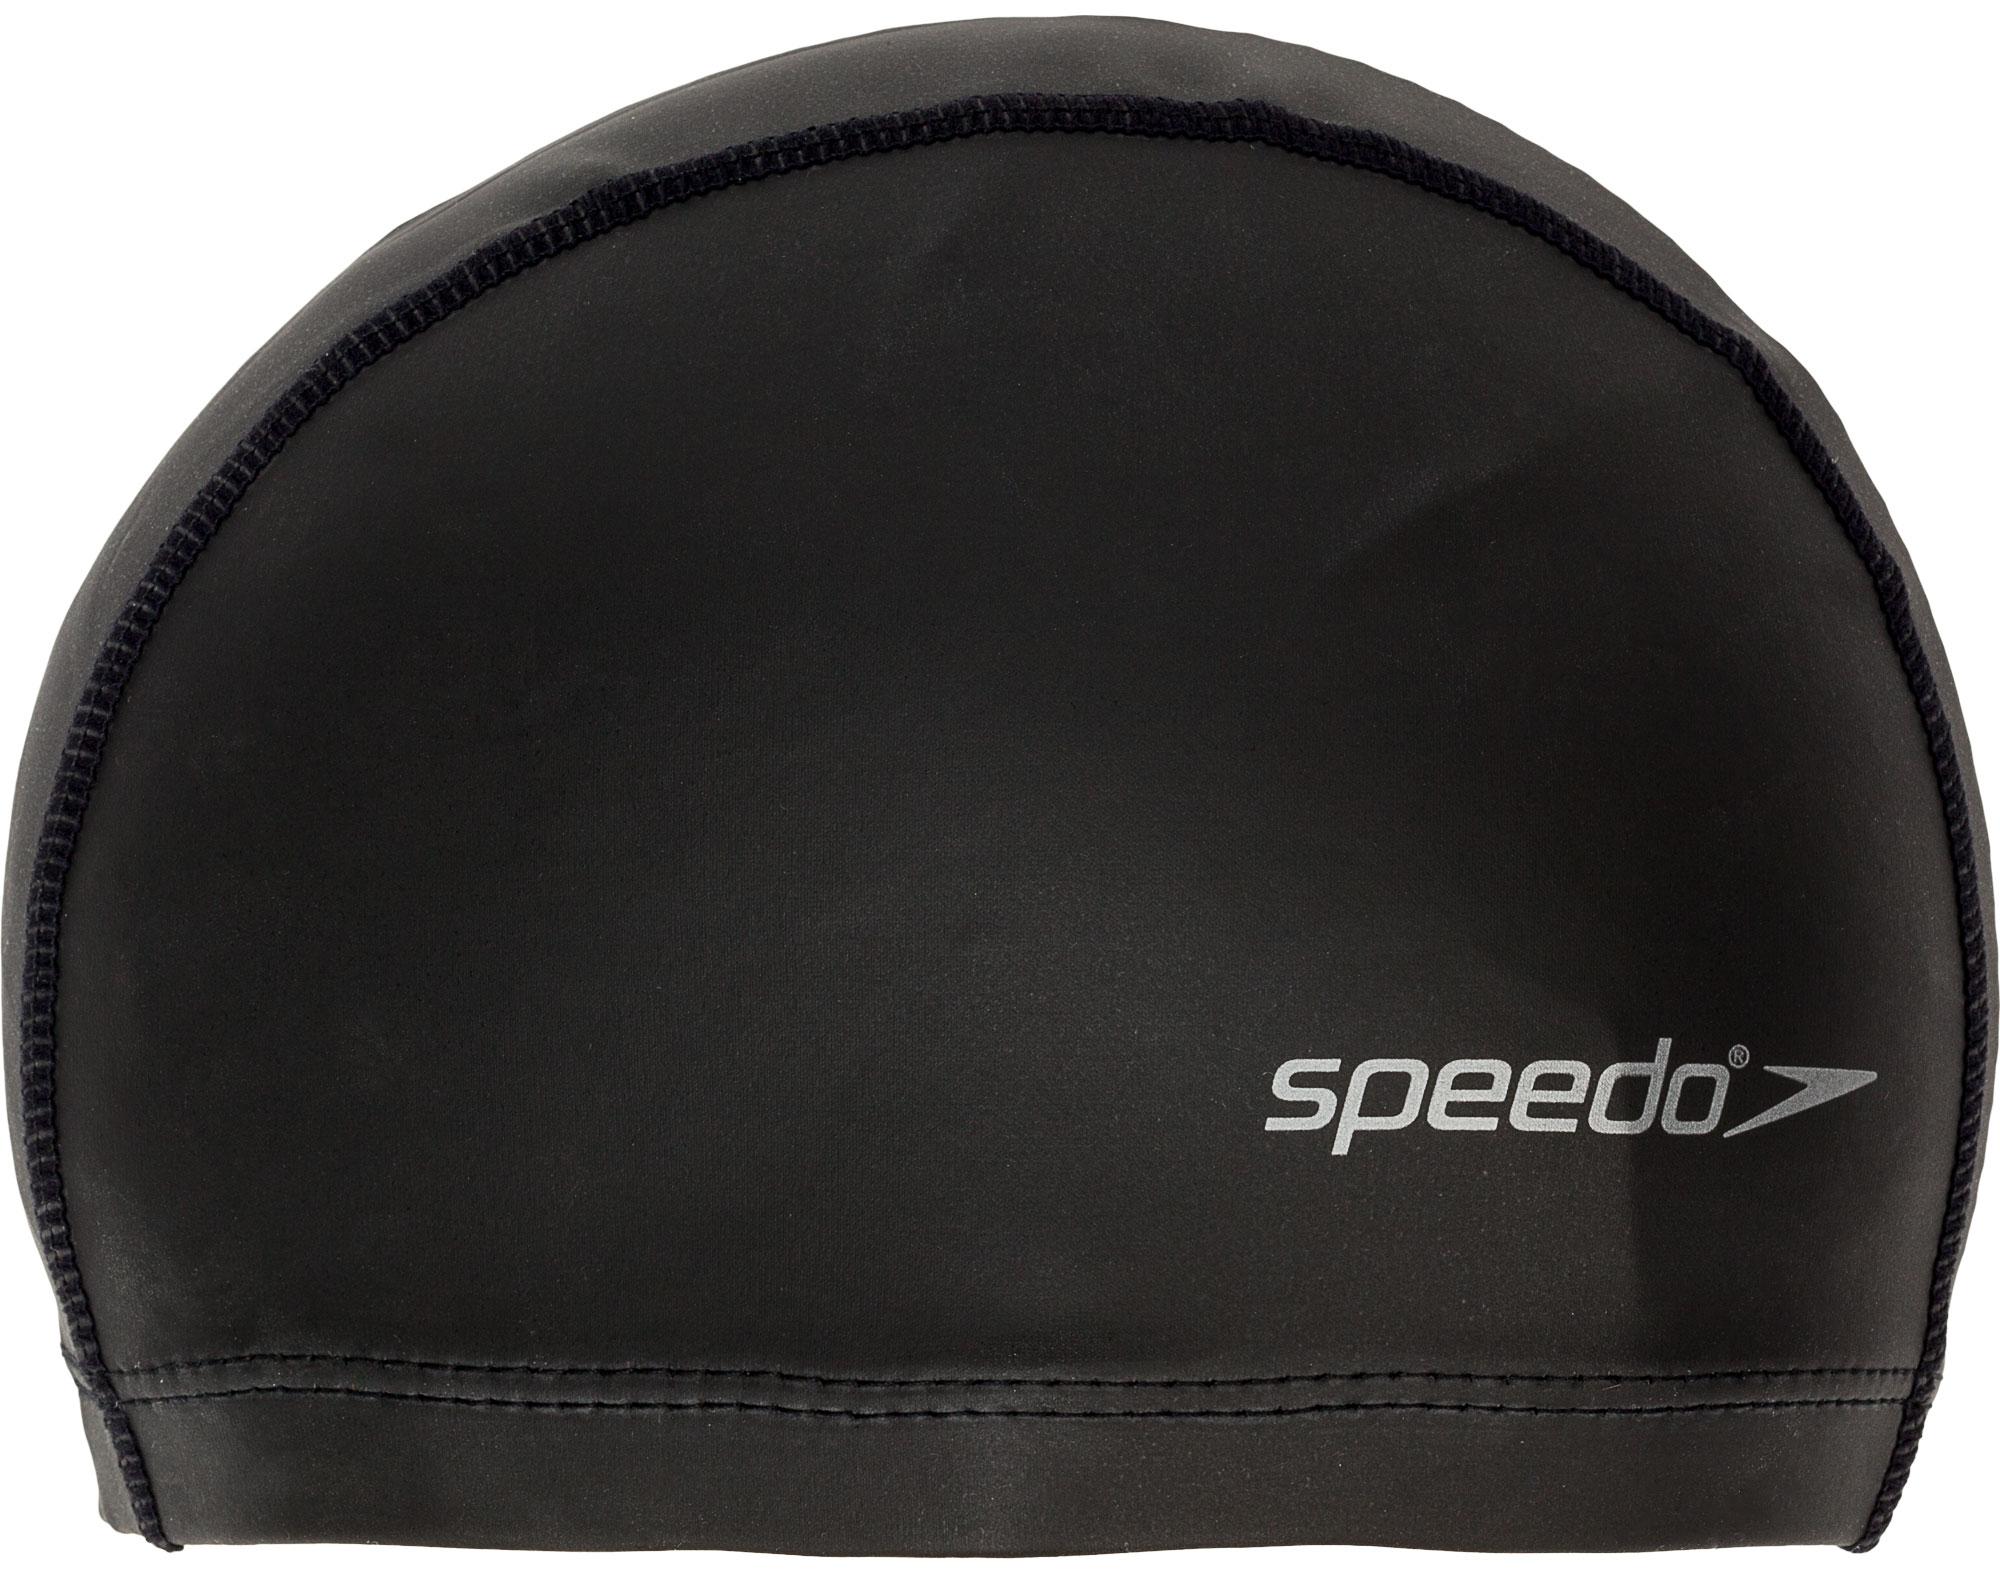 Speedo Шапочка для плавания Speedo Pace купить маску и трубку для подводного плавания